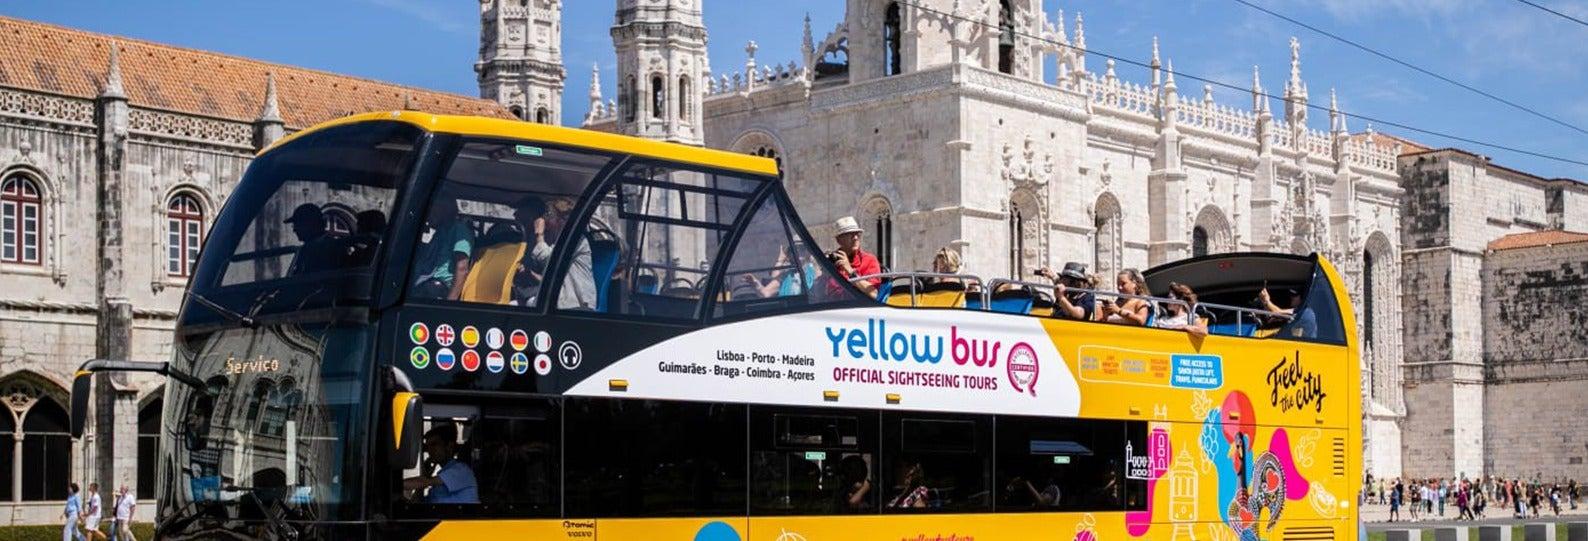 Ônibus turístico de Lisboa